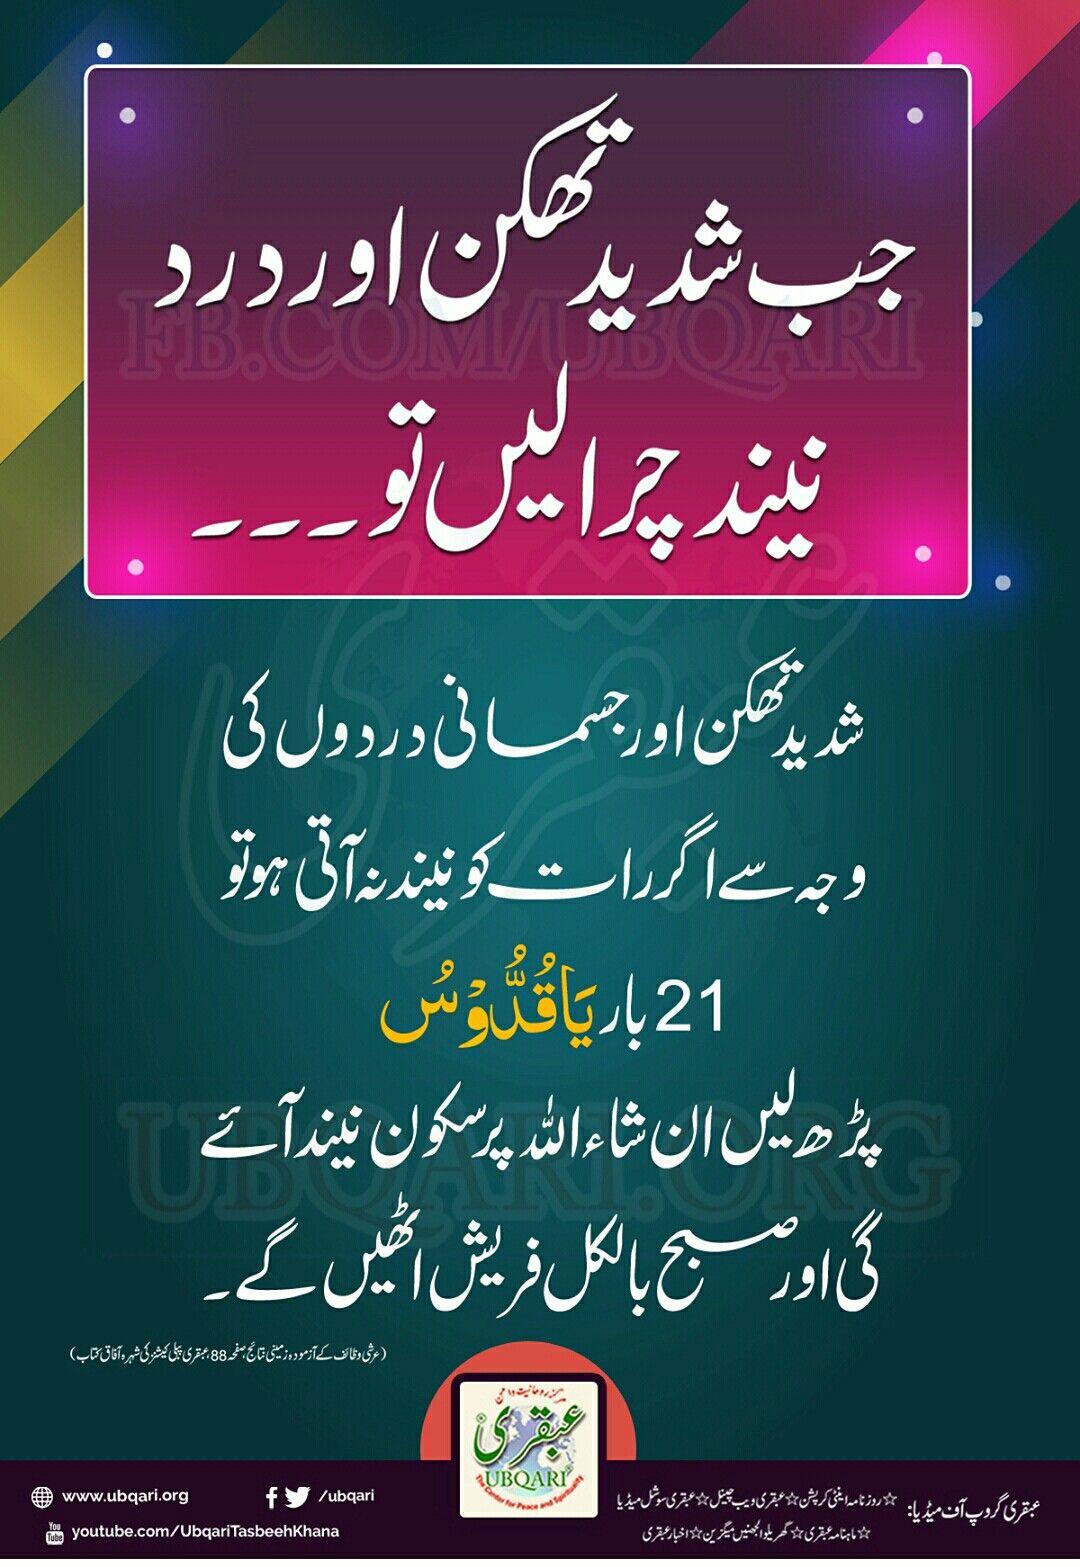 Pin By Afreen Khan On Allah Wale Islamic Quotes Quran Islamic Quotes Islamic Inspirational Quotes